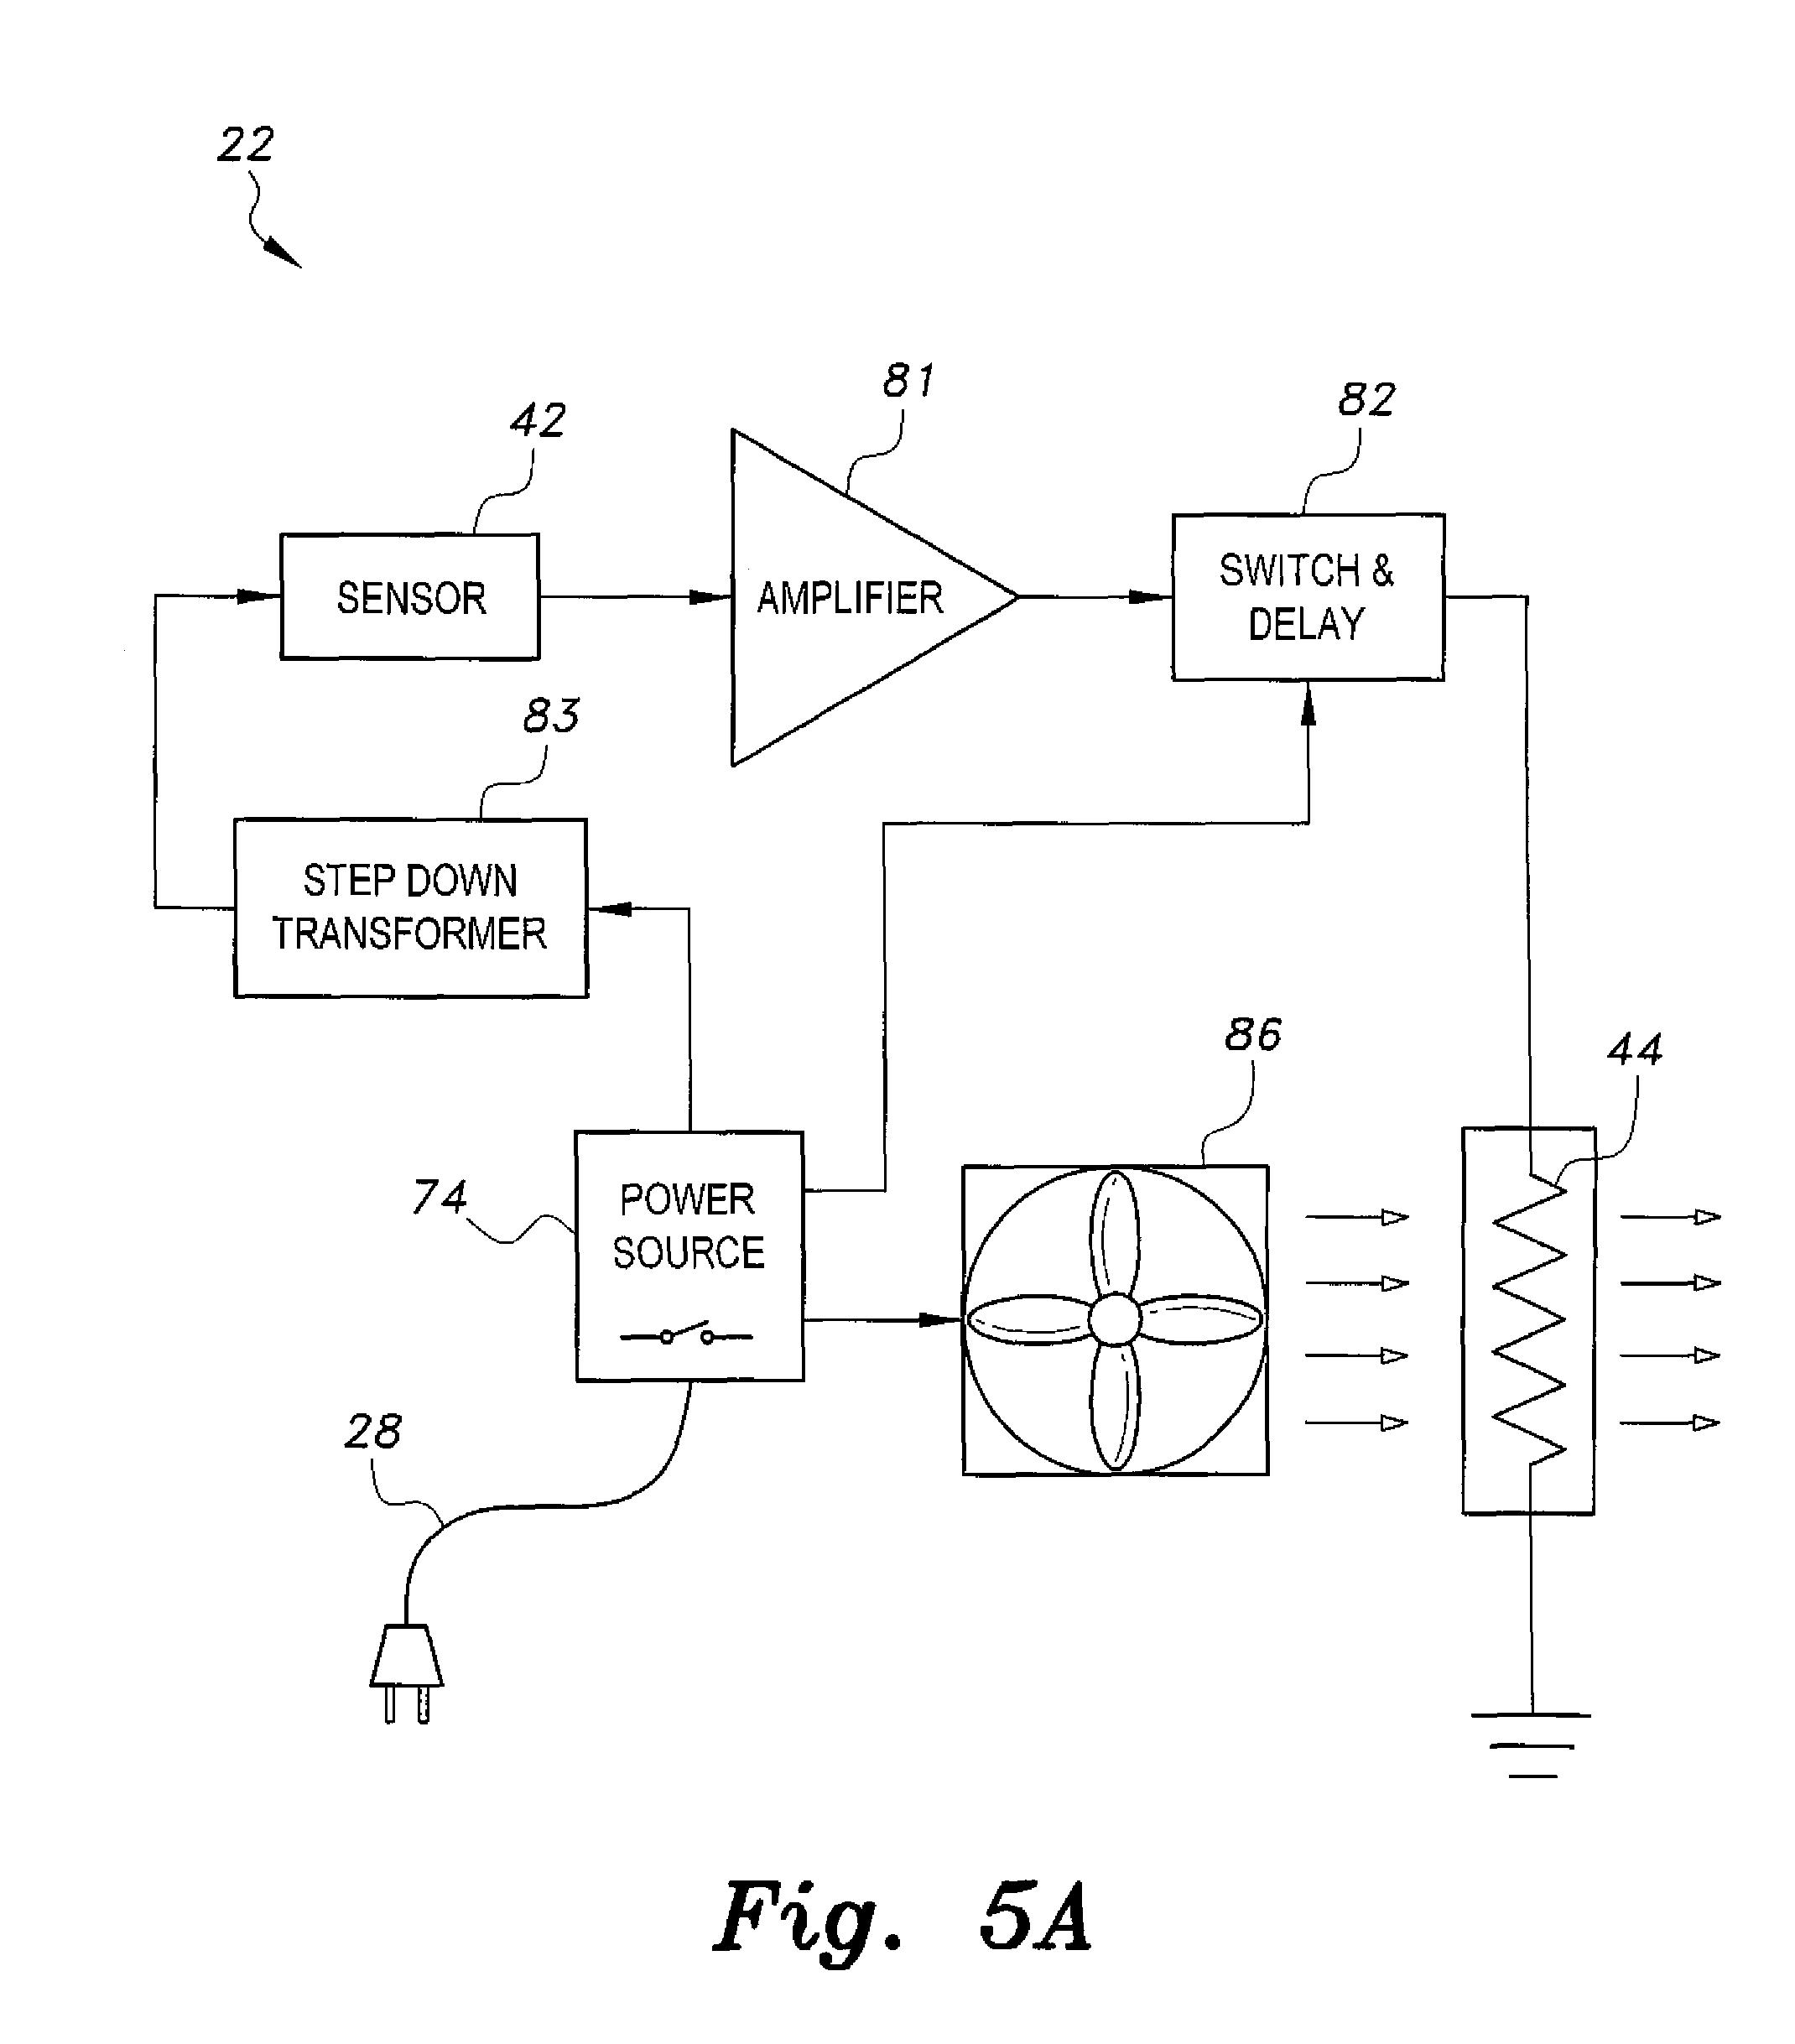 Hair Dryer Circuit Diagram Wiring Diagrams Http Wwwseekiccom Circuitdiagram Basiccircuit Digitalsystemac Patent Us8720078 Automatic With Fluid Kenmore